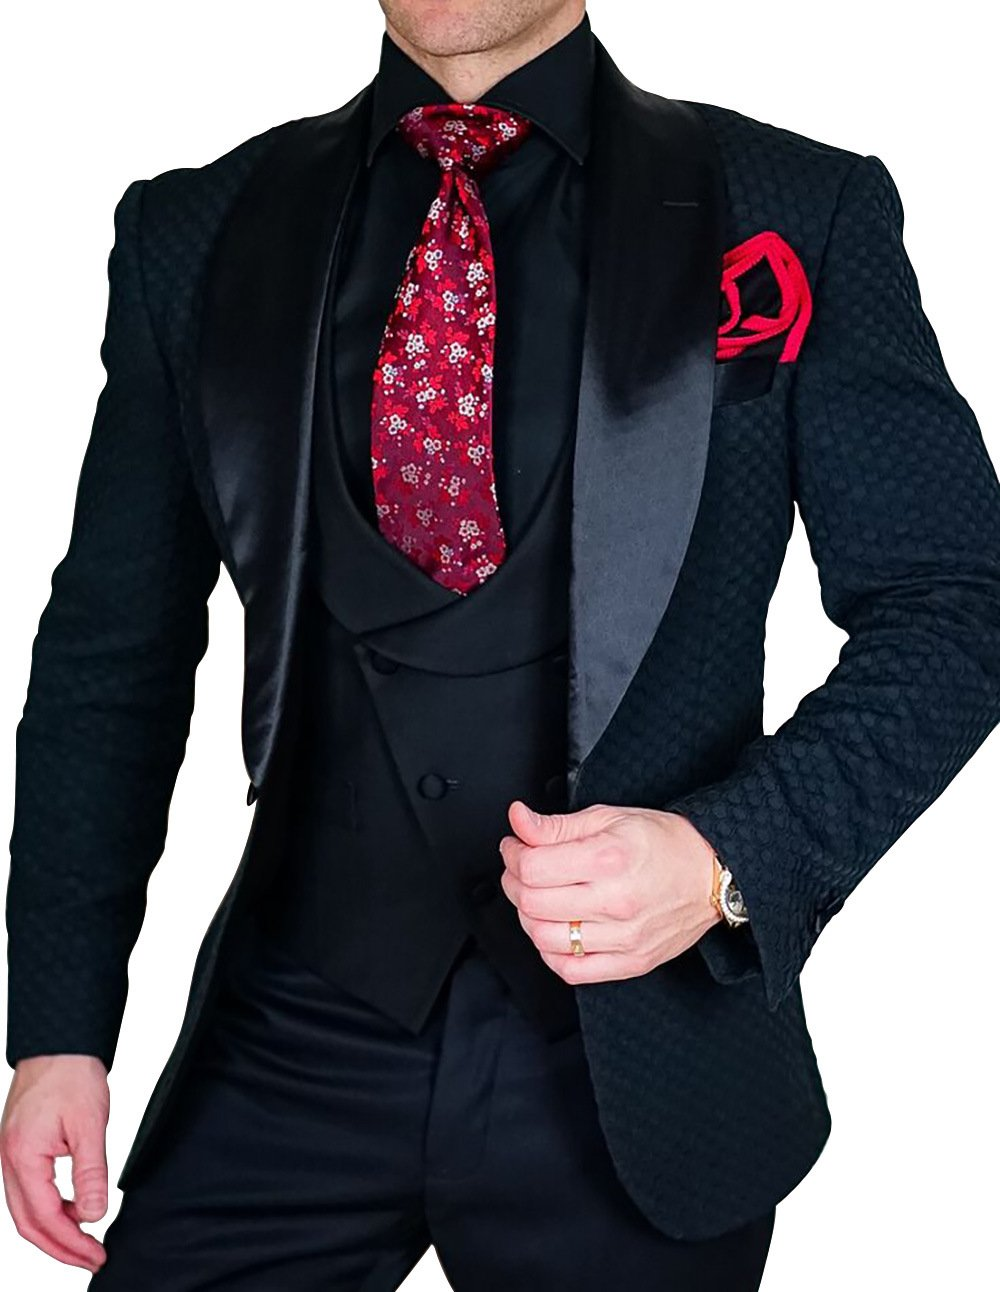 Yunjia Premium Grid Jacquard Paisley Plaid Check Slim Fit Tuxedo Prom Wedding Groom Party Suits Blazers Jacket Coat,Black